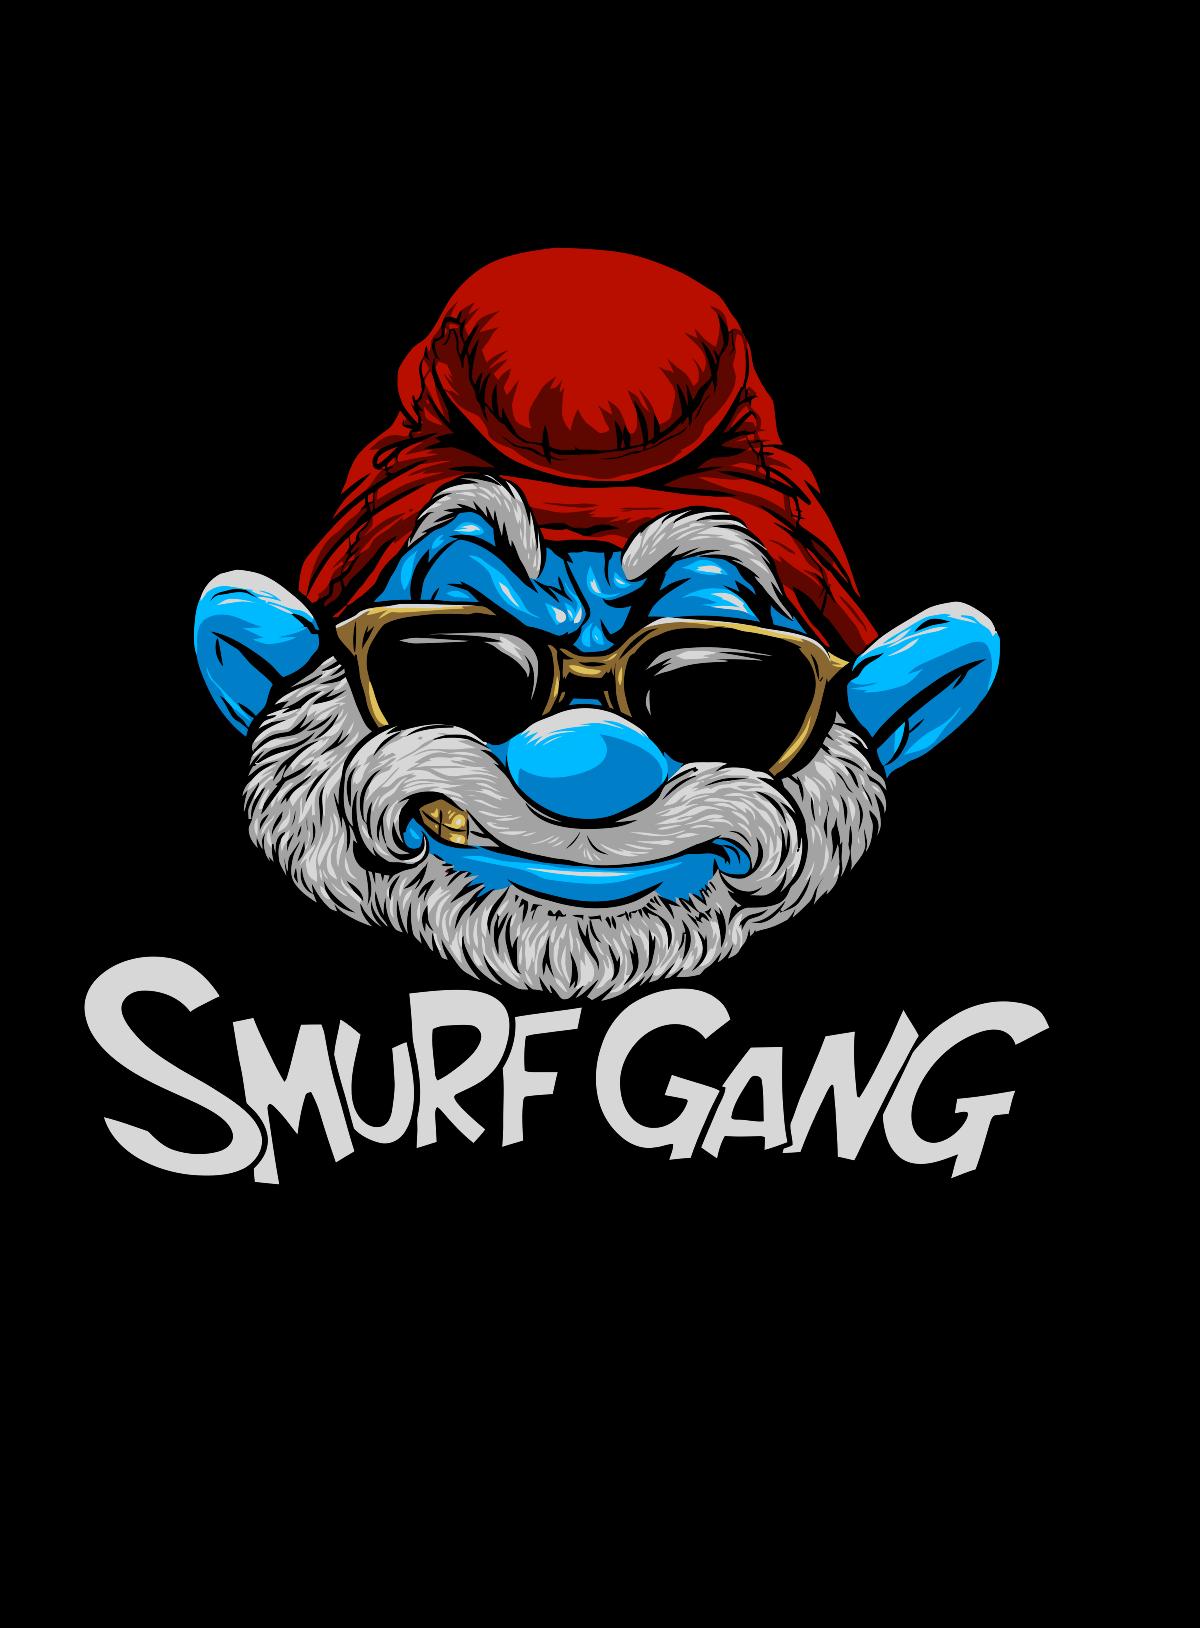 Smurf Gang